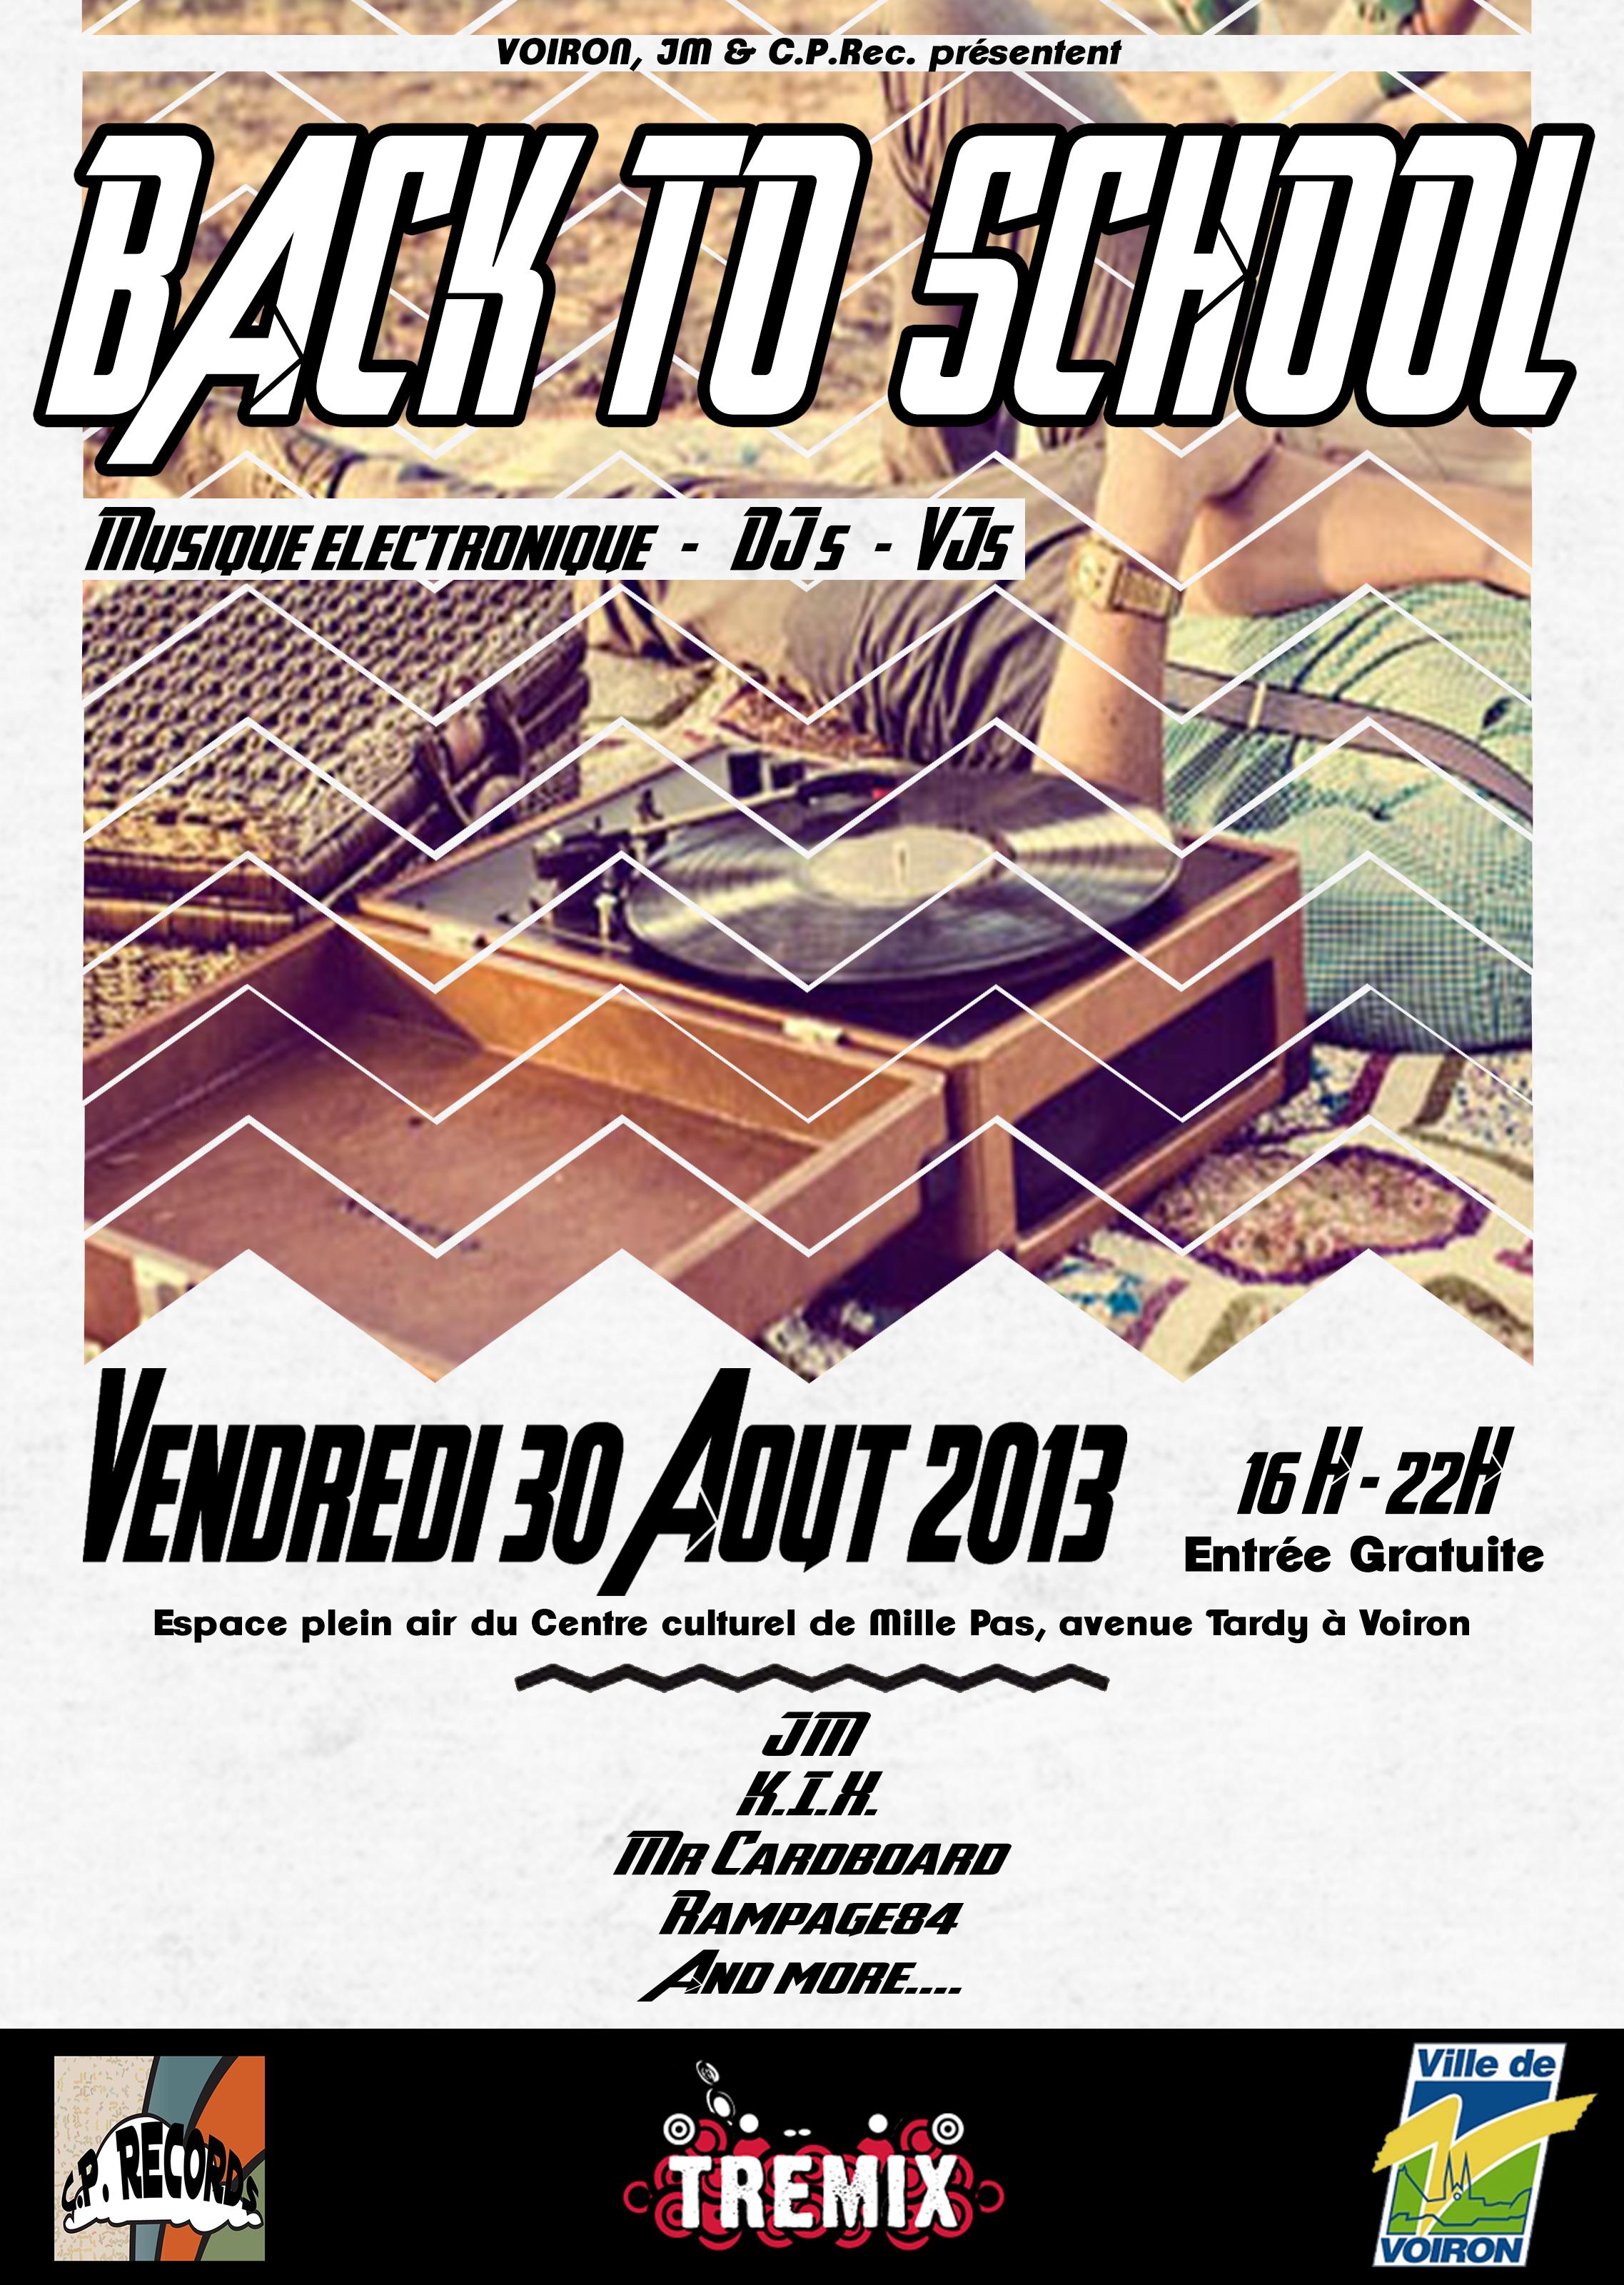 Back to school – Scène Electro